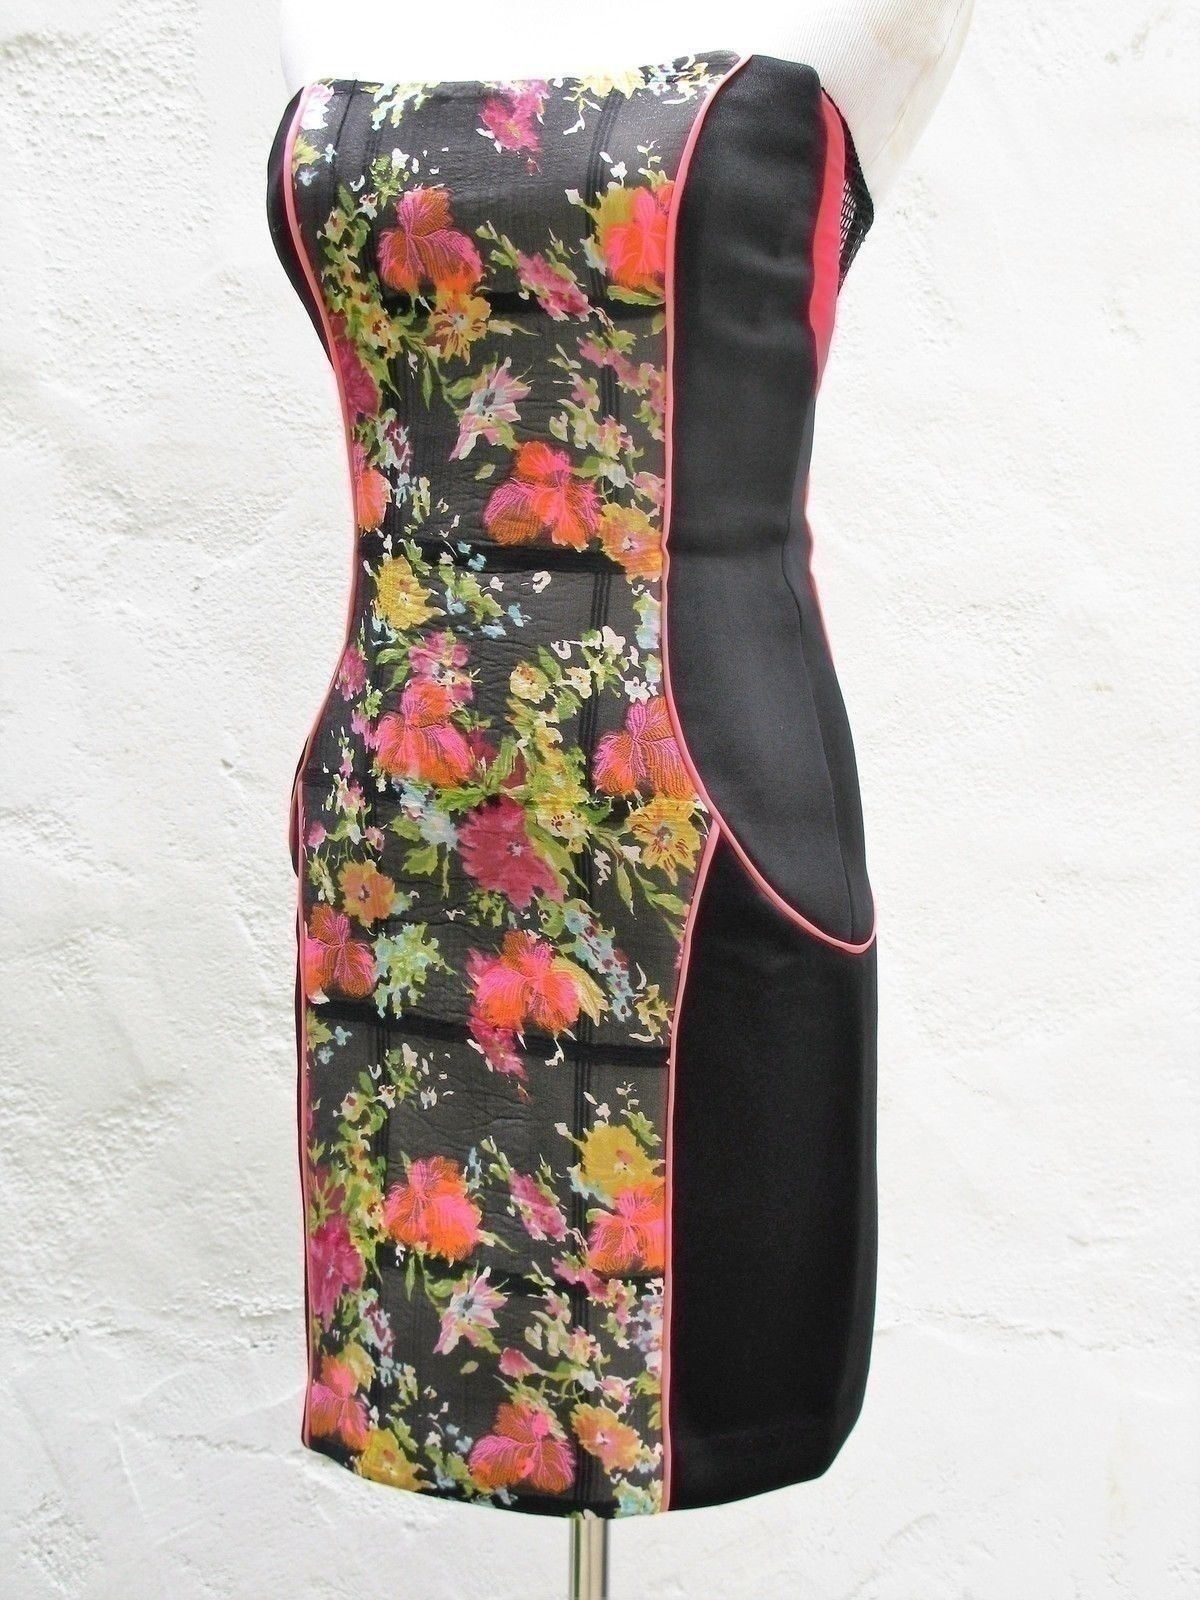 Neoprene Dress Cocktail Dress Foley+Corinna Jetsetter Dress NEW S NWT $350 MSRP